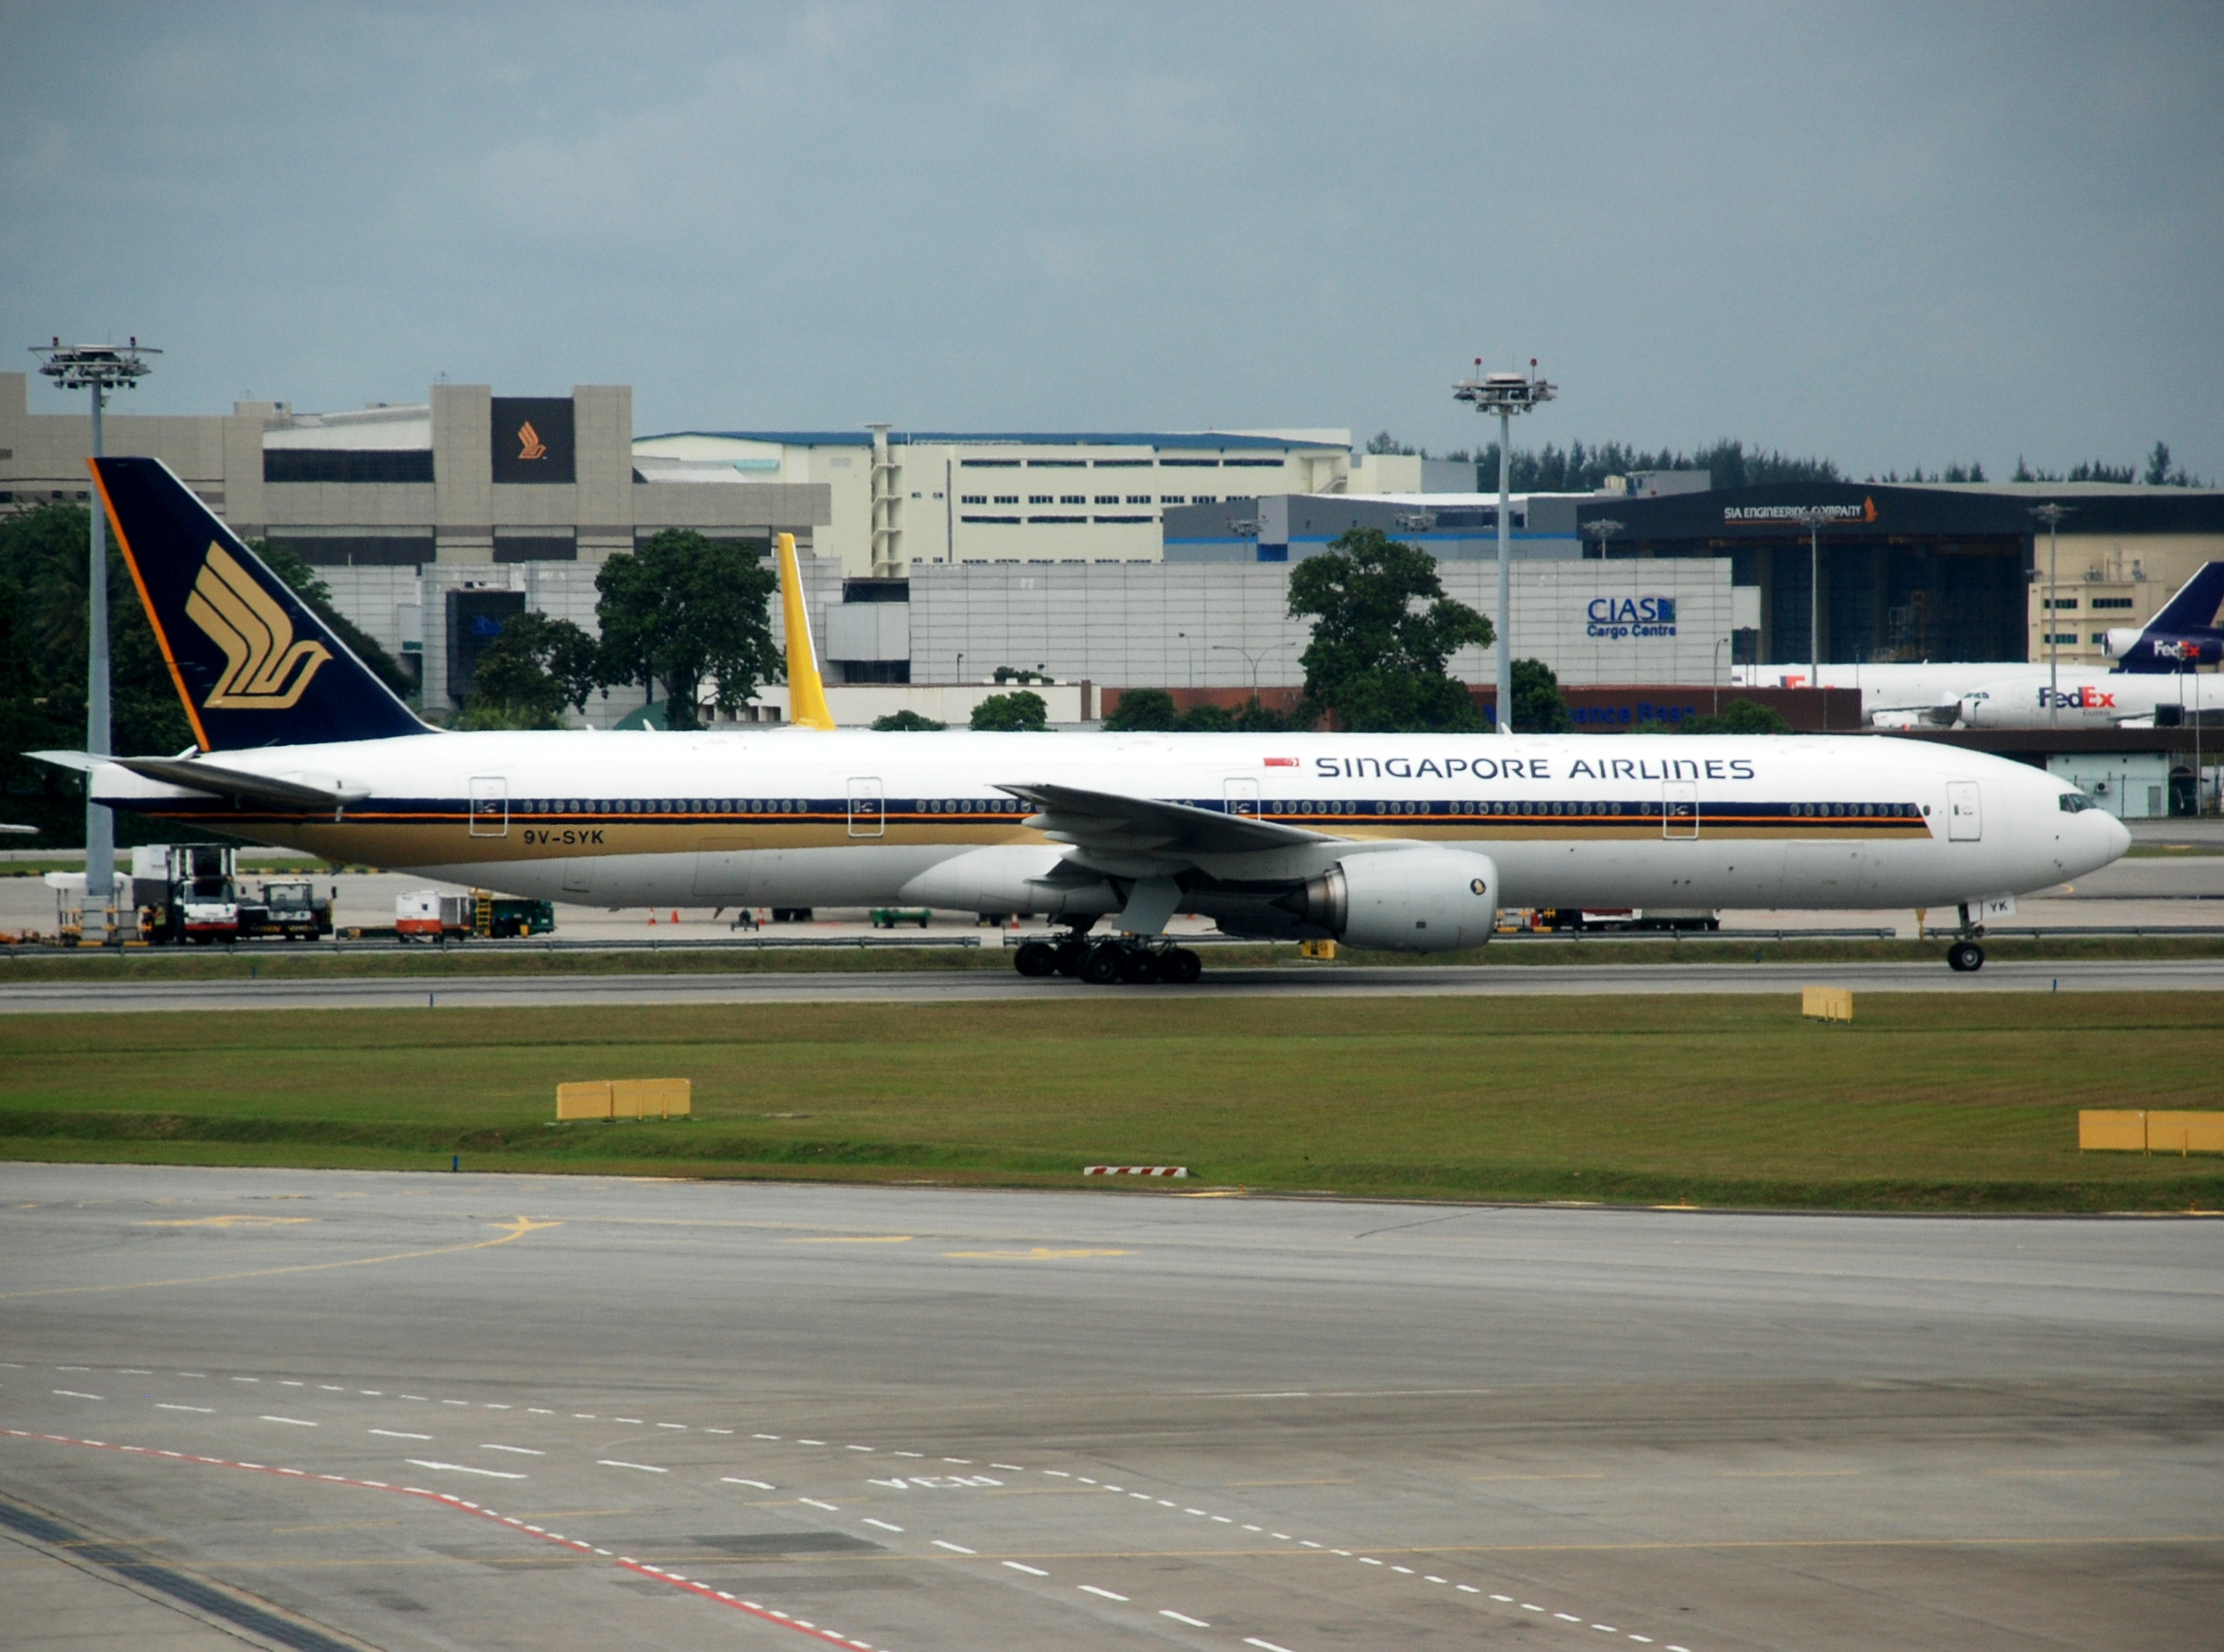 File:SIA Boeing 777-300, SIN.jpg - Wikimedia Commons